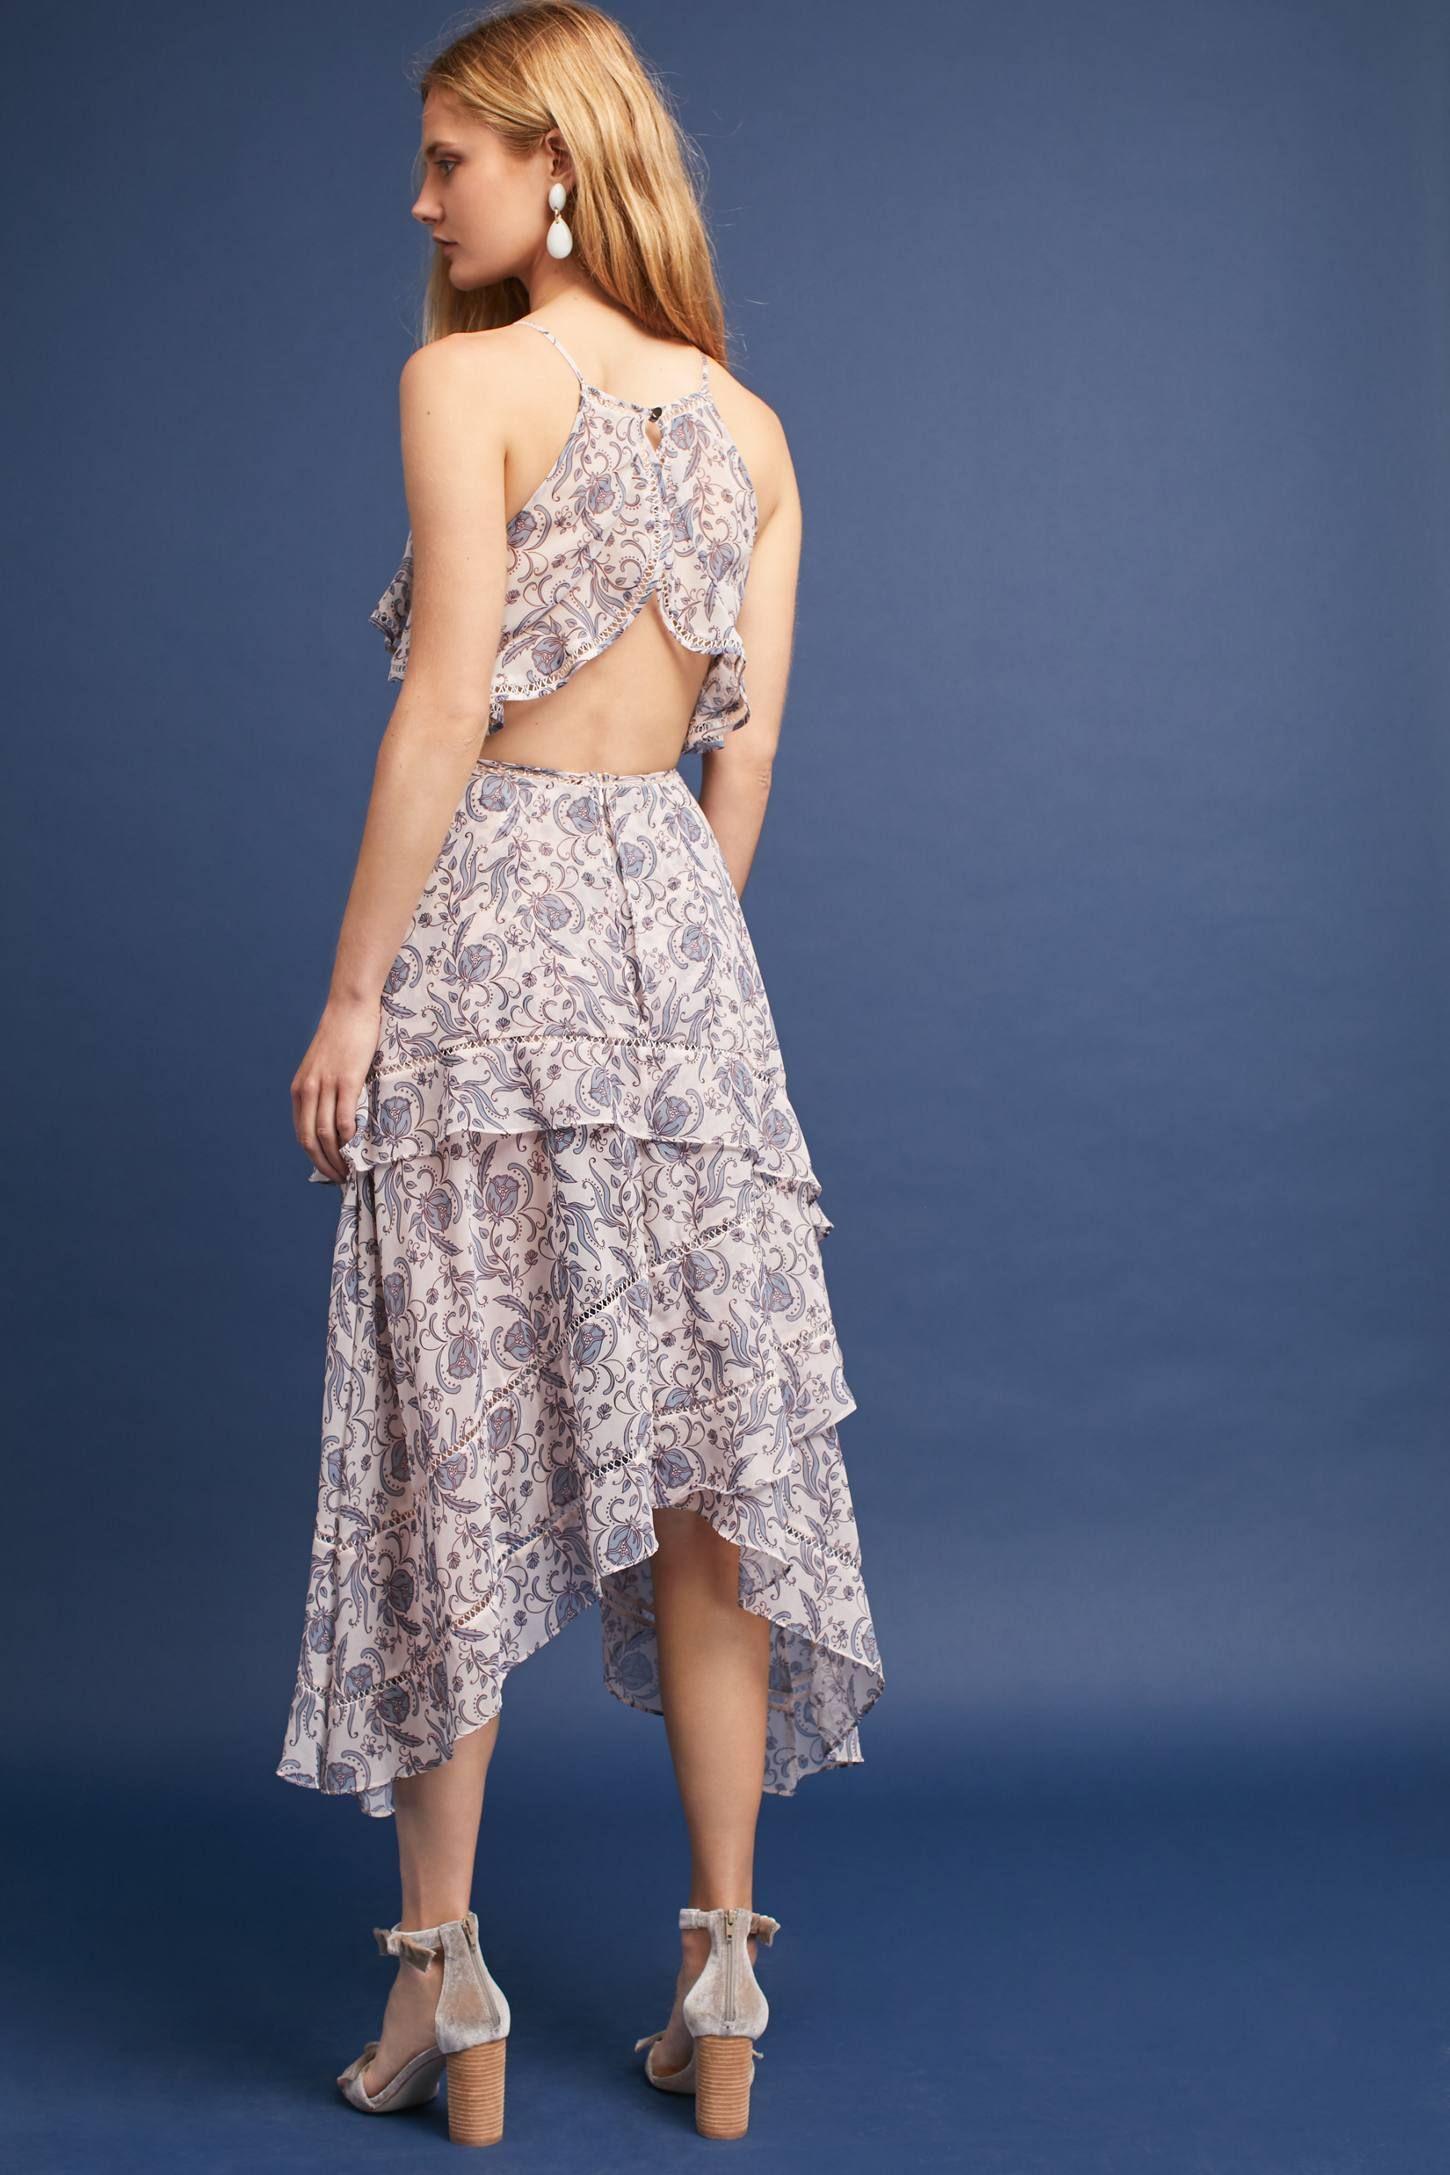 Dorable Vestidos De Novia Corte Ingles Vignette - Womens Dresses ...